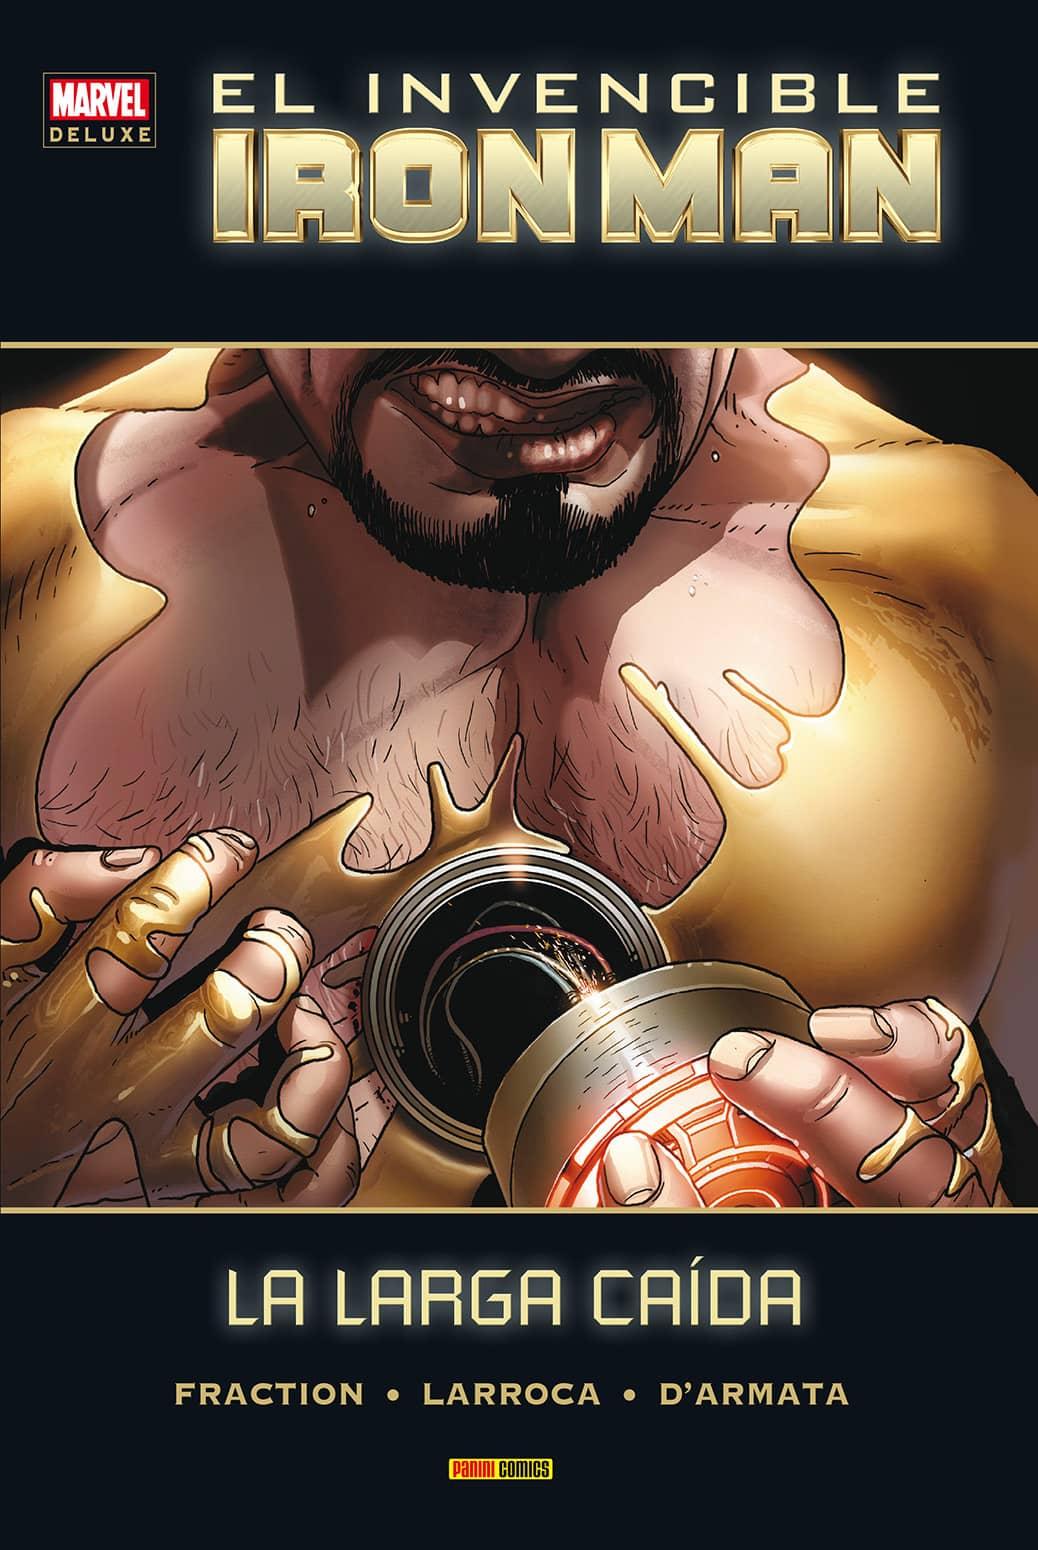 INVENCIBLE IRON MAN 07. LA LARGA CAIDA  (MARVEL DELUXE)